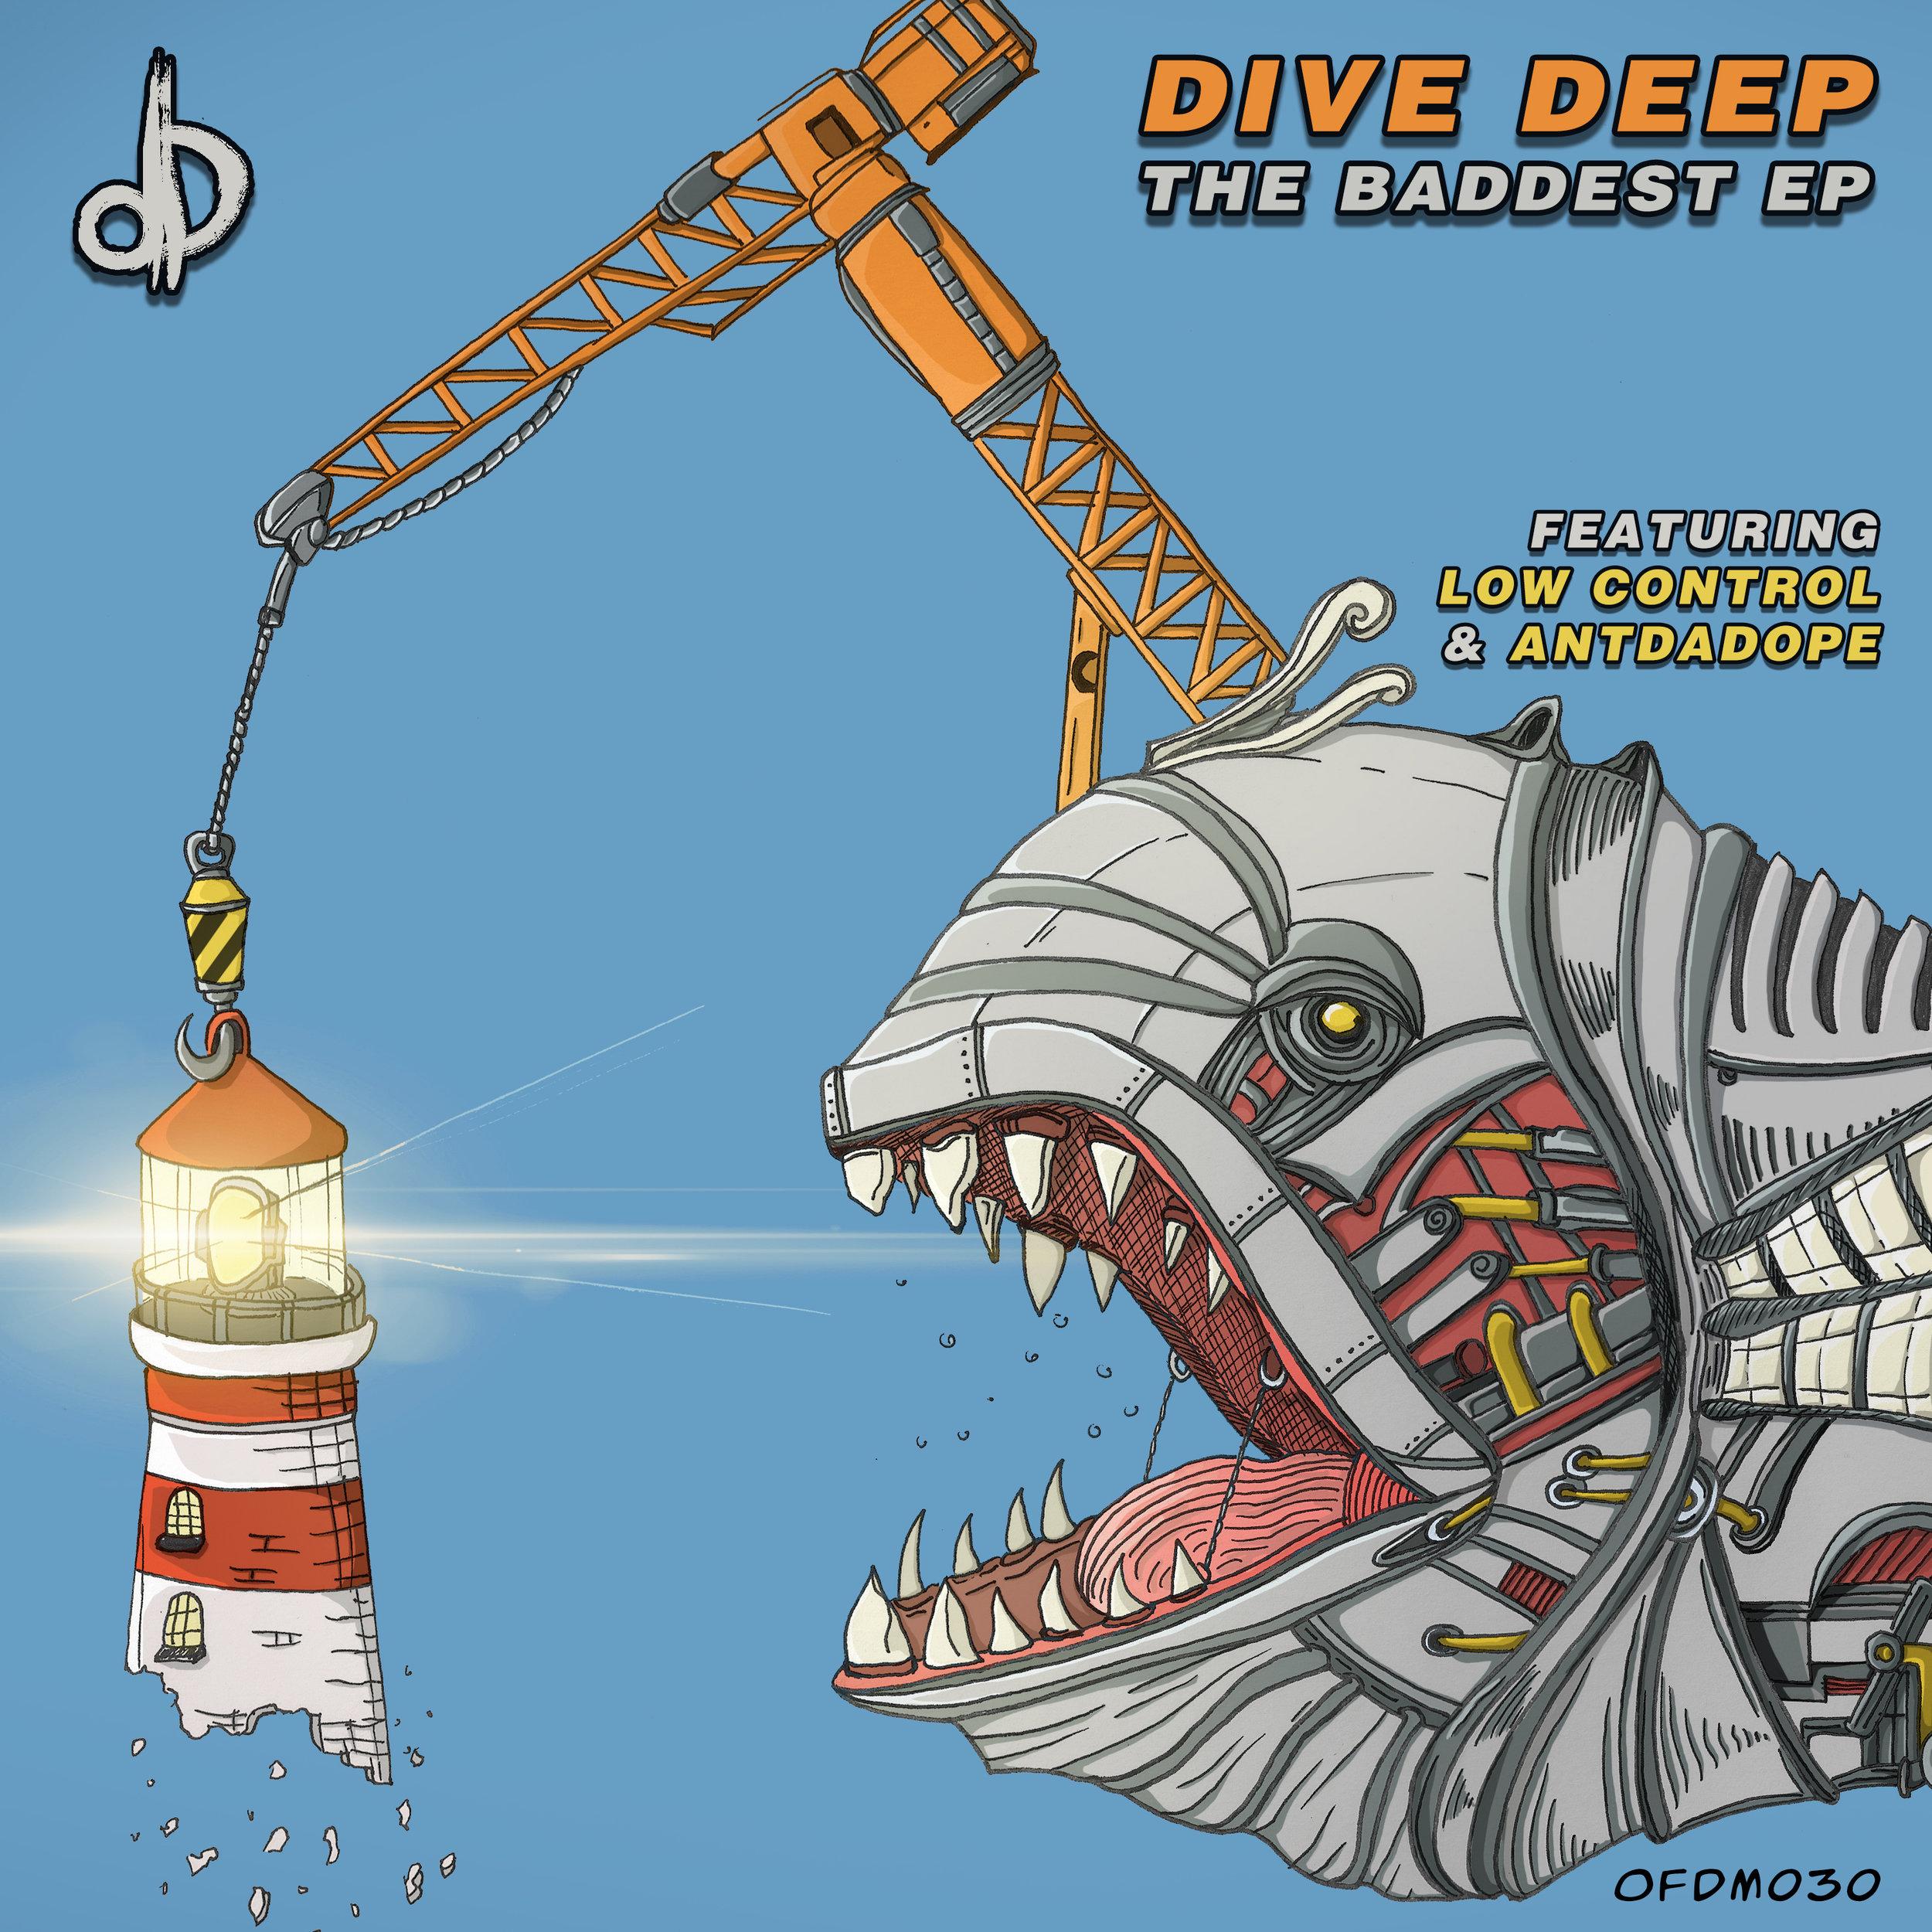 [OFDM030] Dive Deep - The Baddest EP.jpg